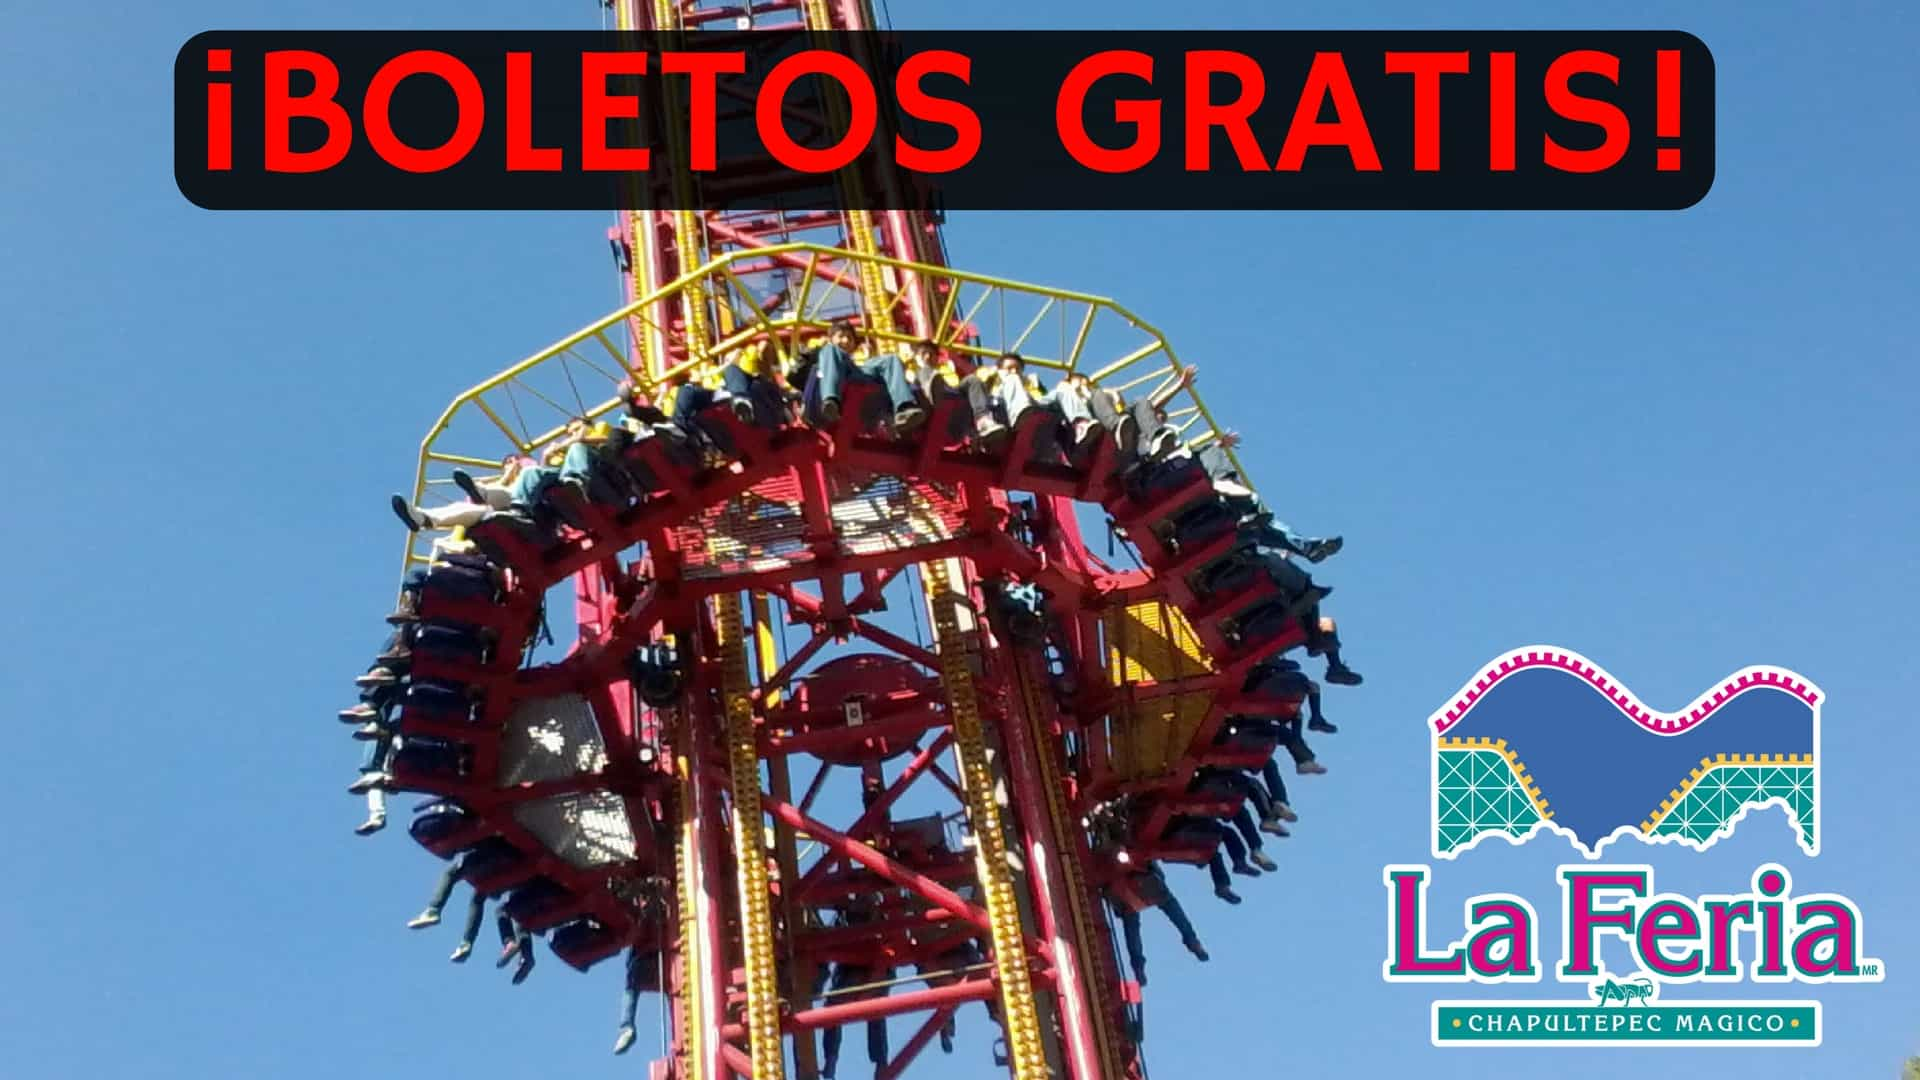 Boletos Para La Feria De Chapultepec Totalmente Gratis El Souvenir